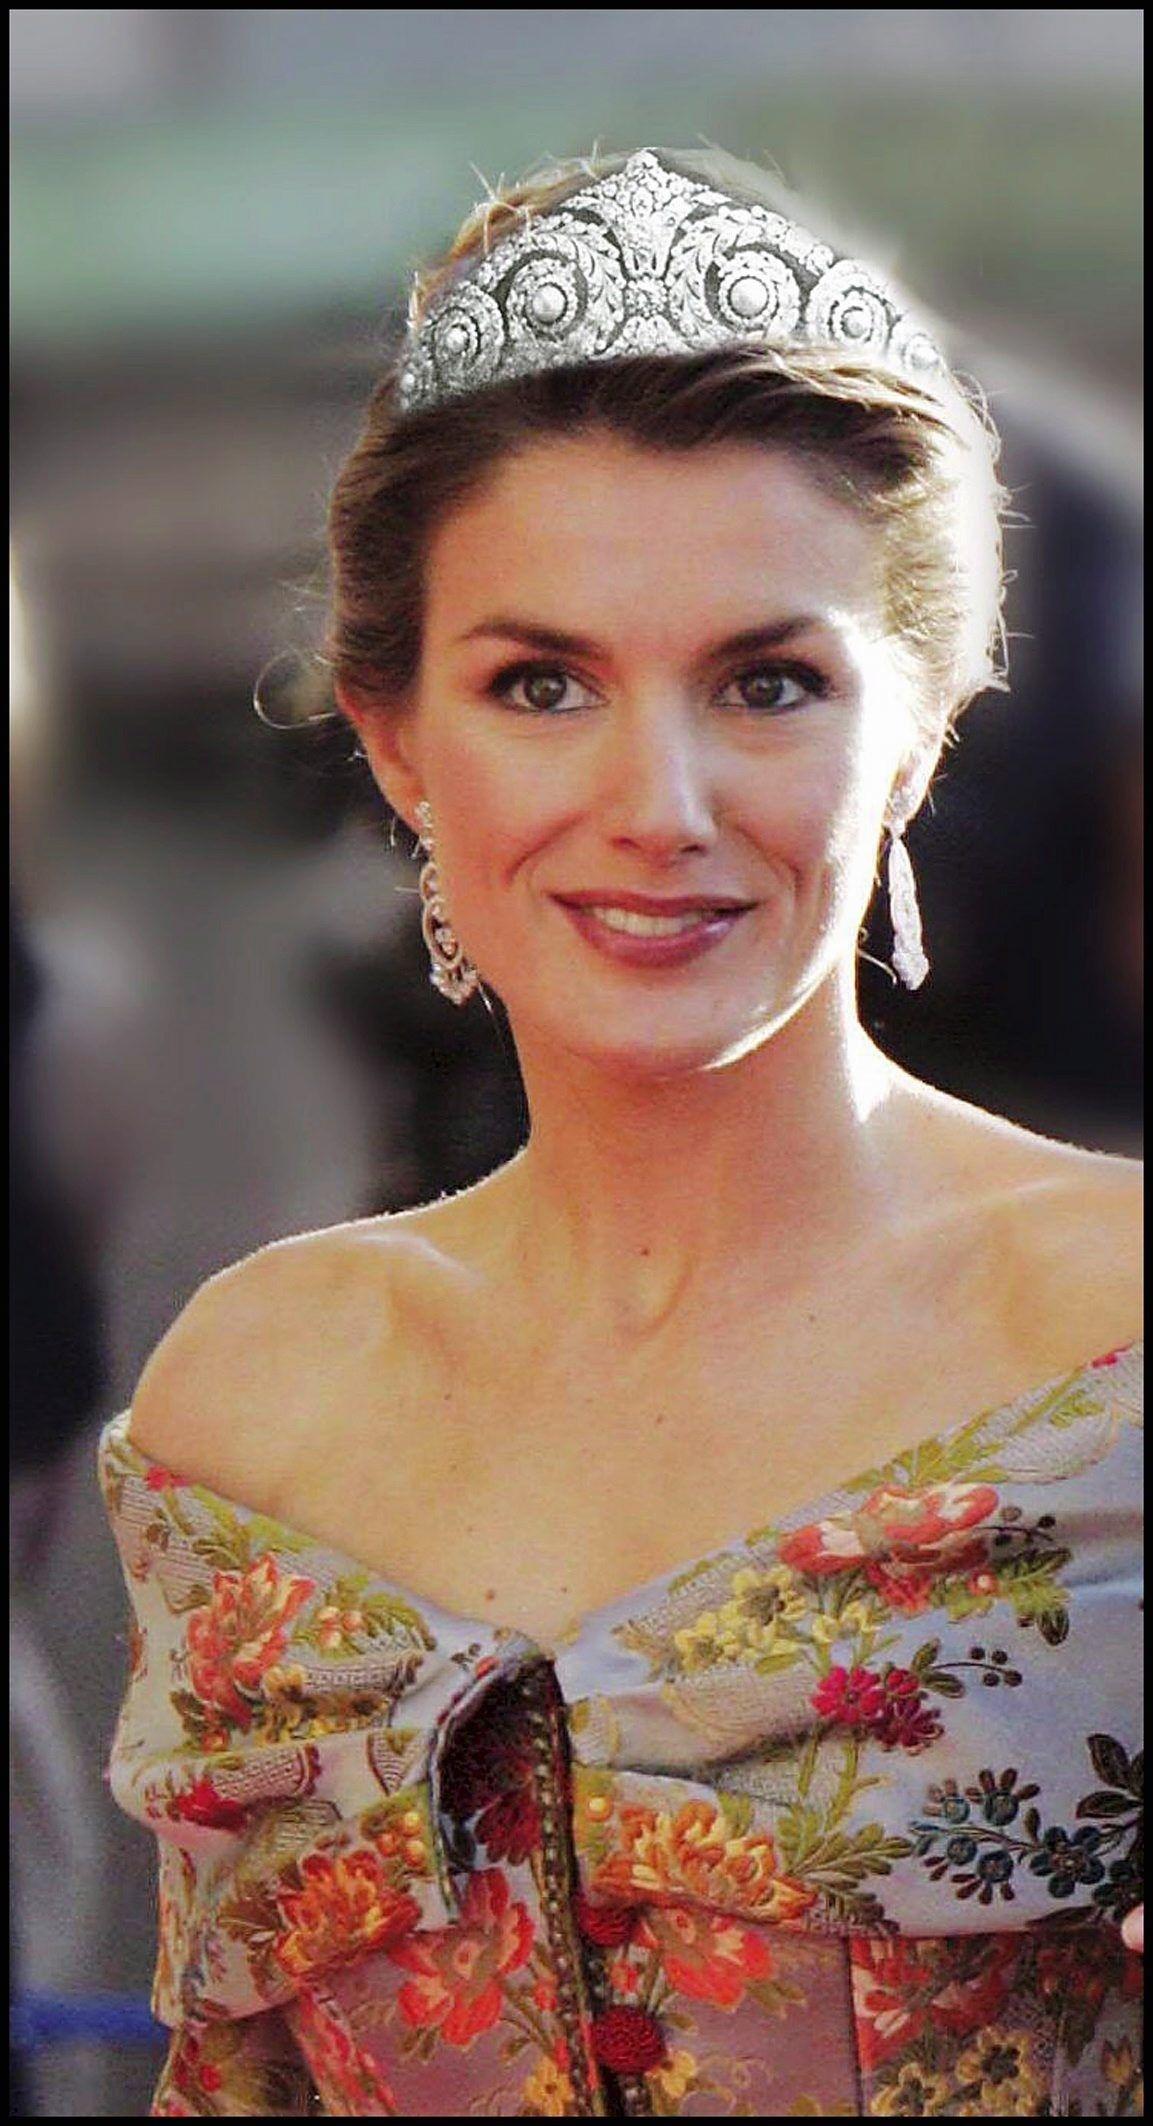 Royal themed wedding dresses  Melania Trump turns heads in custom Dolce u Gabbana gown  Royal